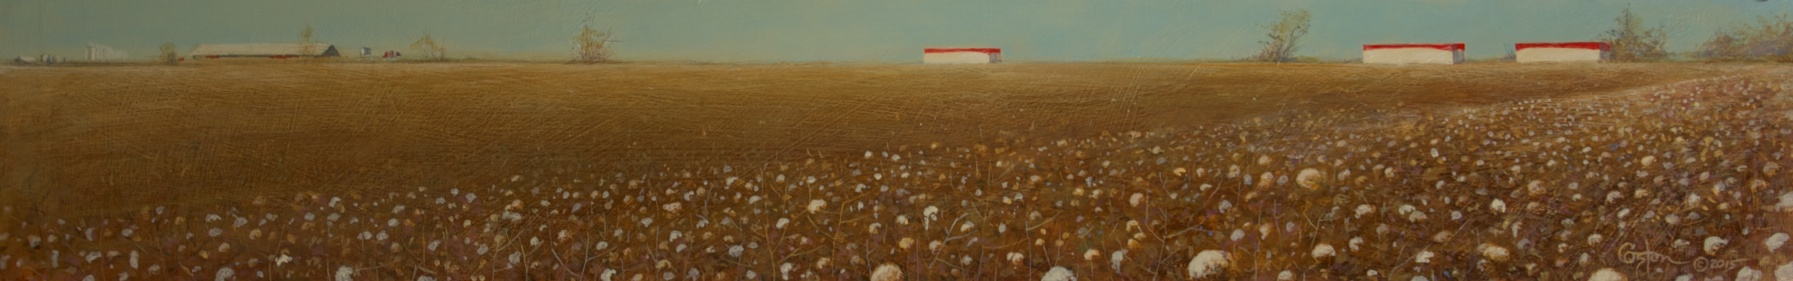 Finish Up Tomorrow, Daniel Coston, 2015